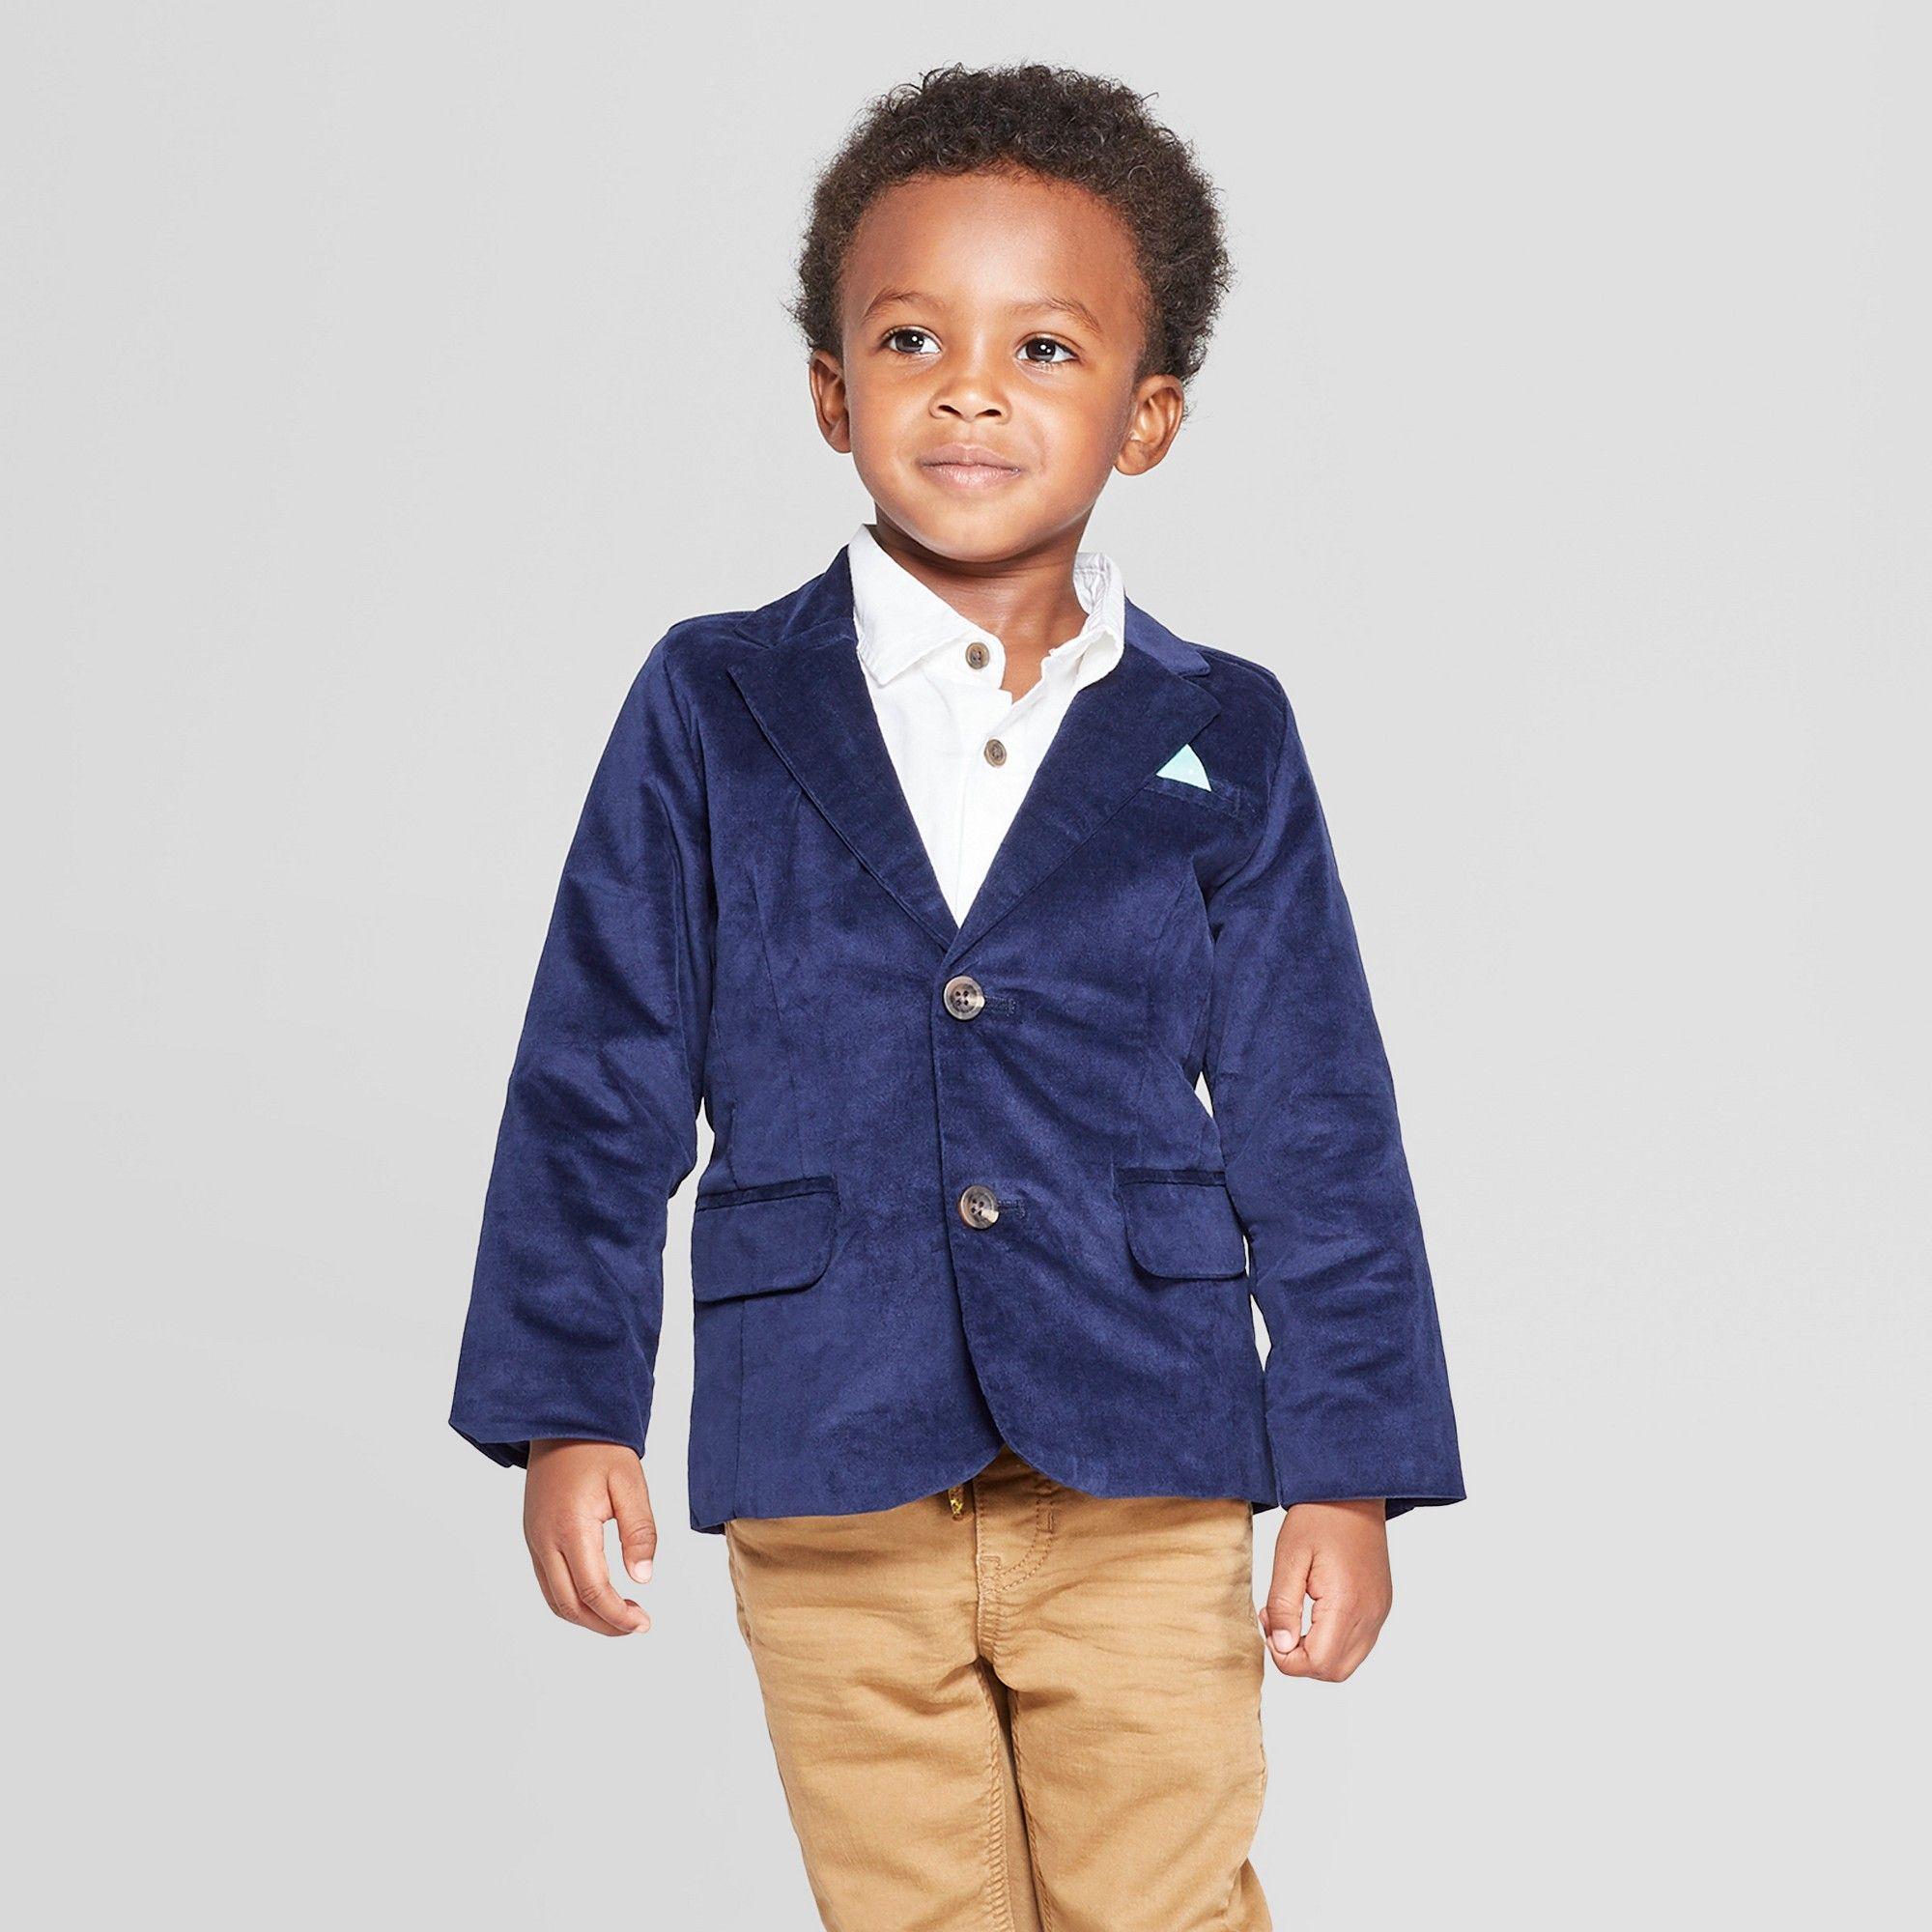 760cf55ed25 Toddler Boys' Velvet Blazer - Cat & Jack Navy 18M, Boy's, Blue ...